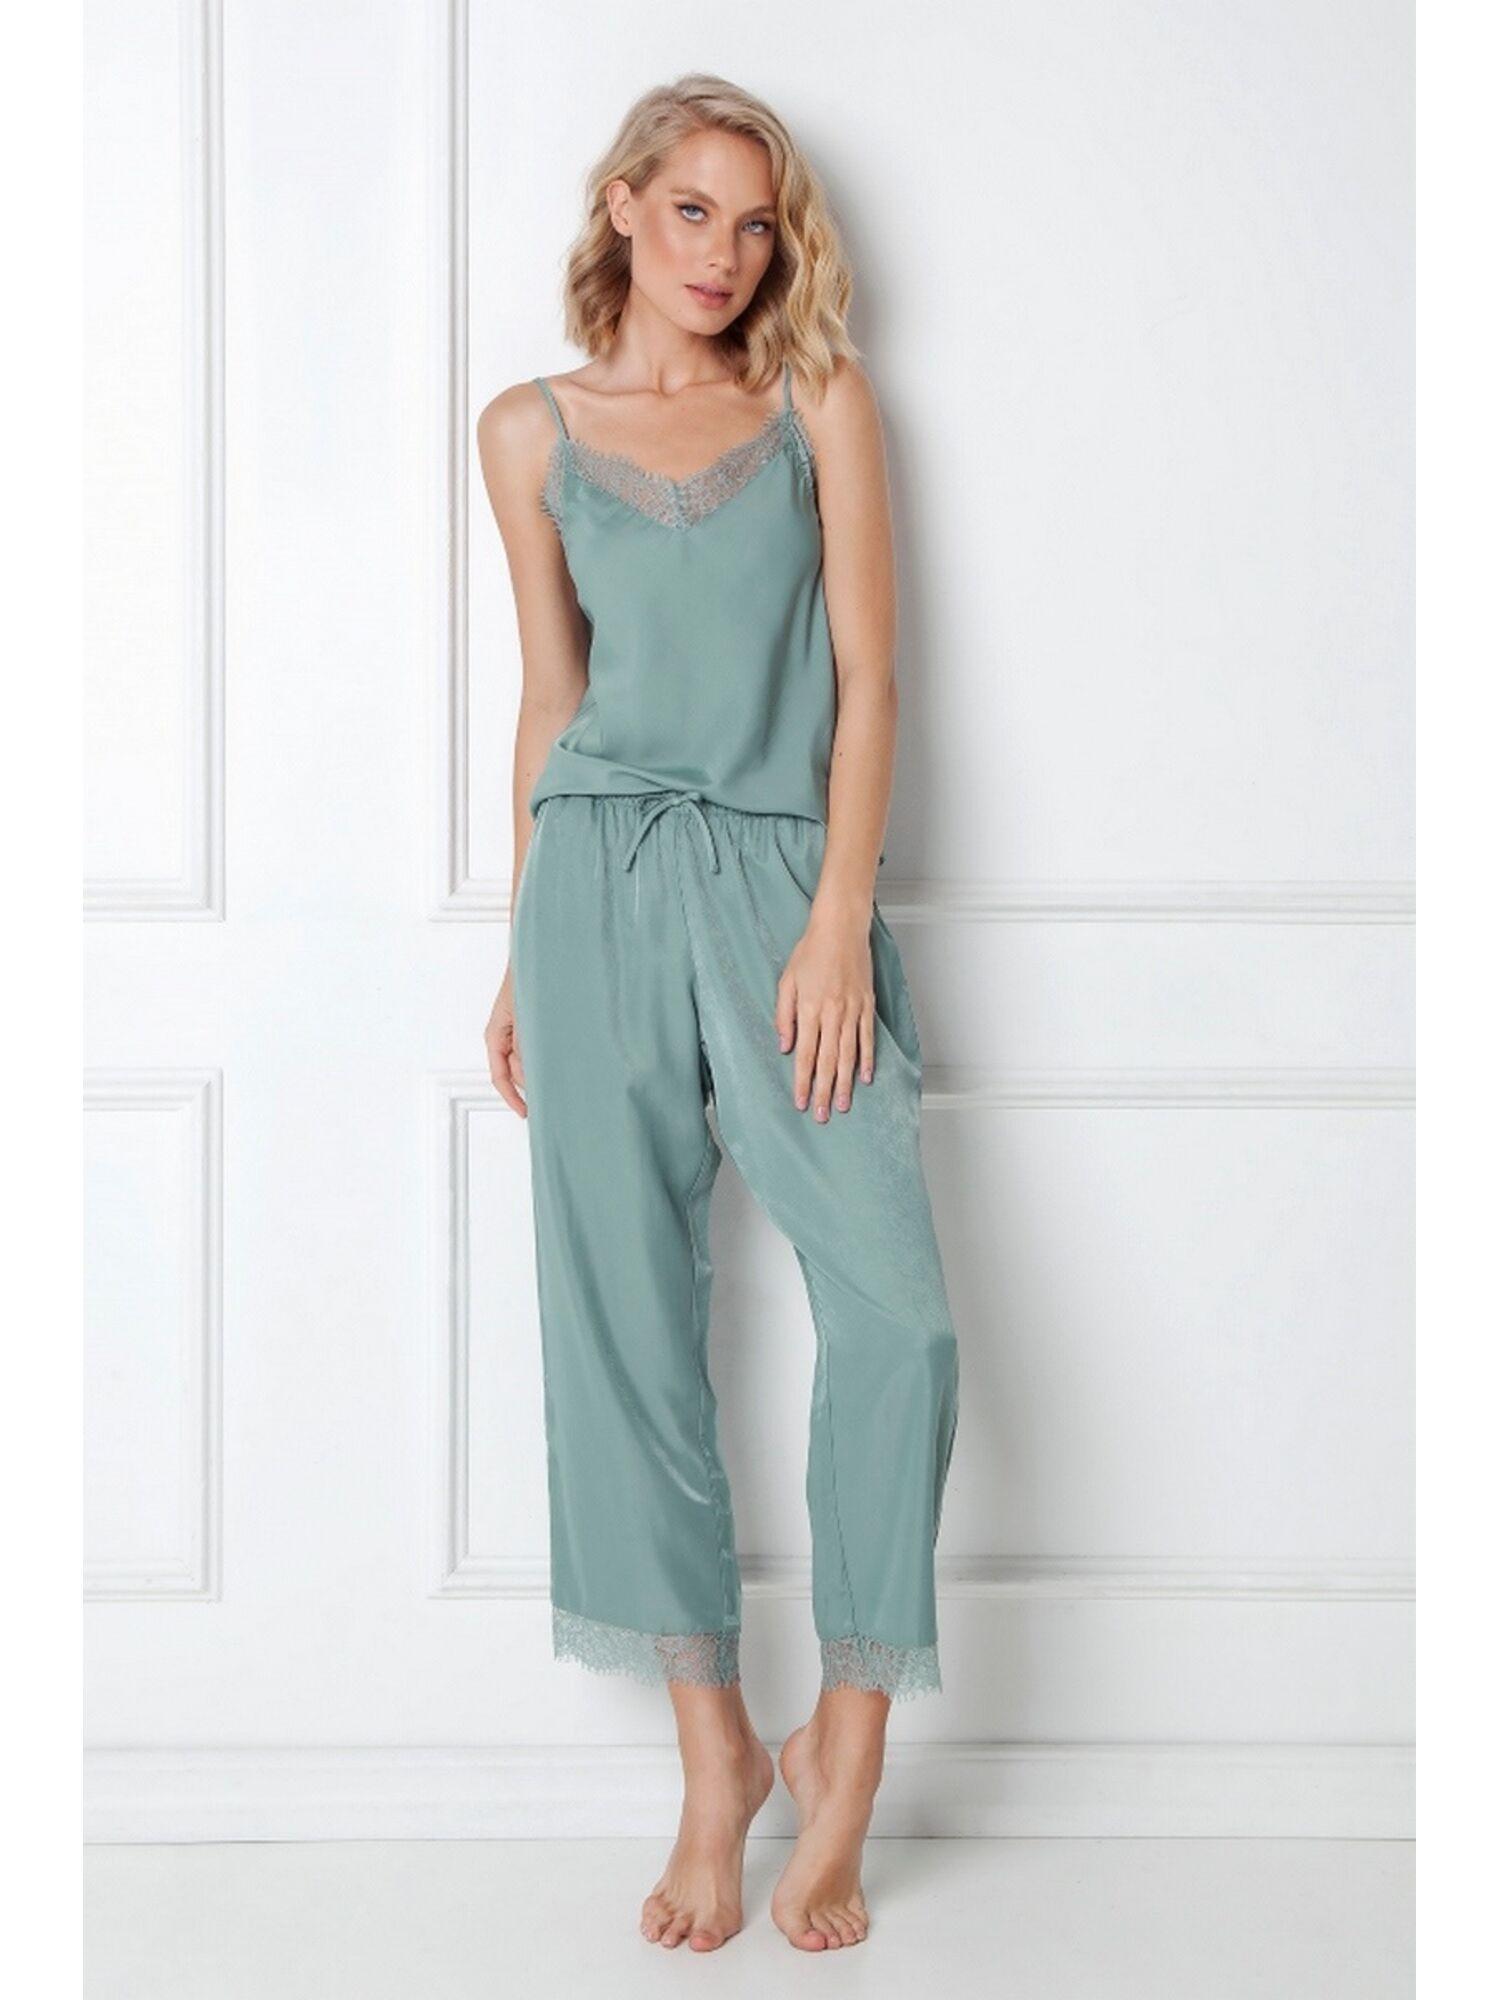 Пижама женская со штанами EMERY, зелёный, ARUELLE